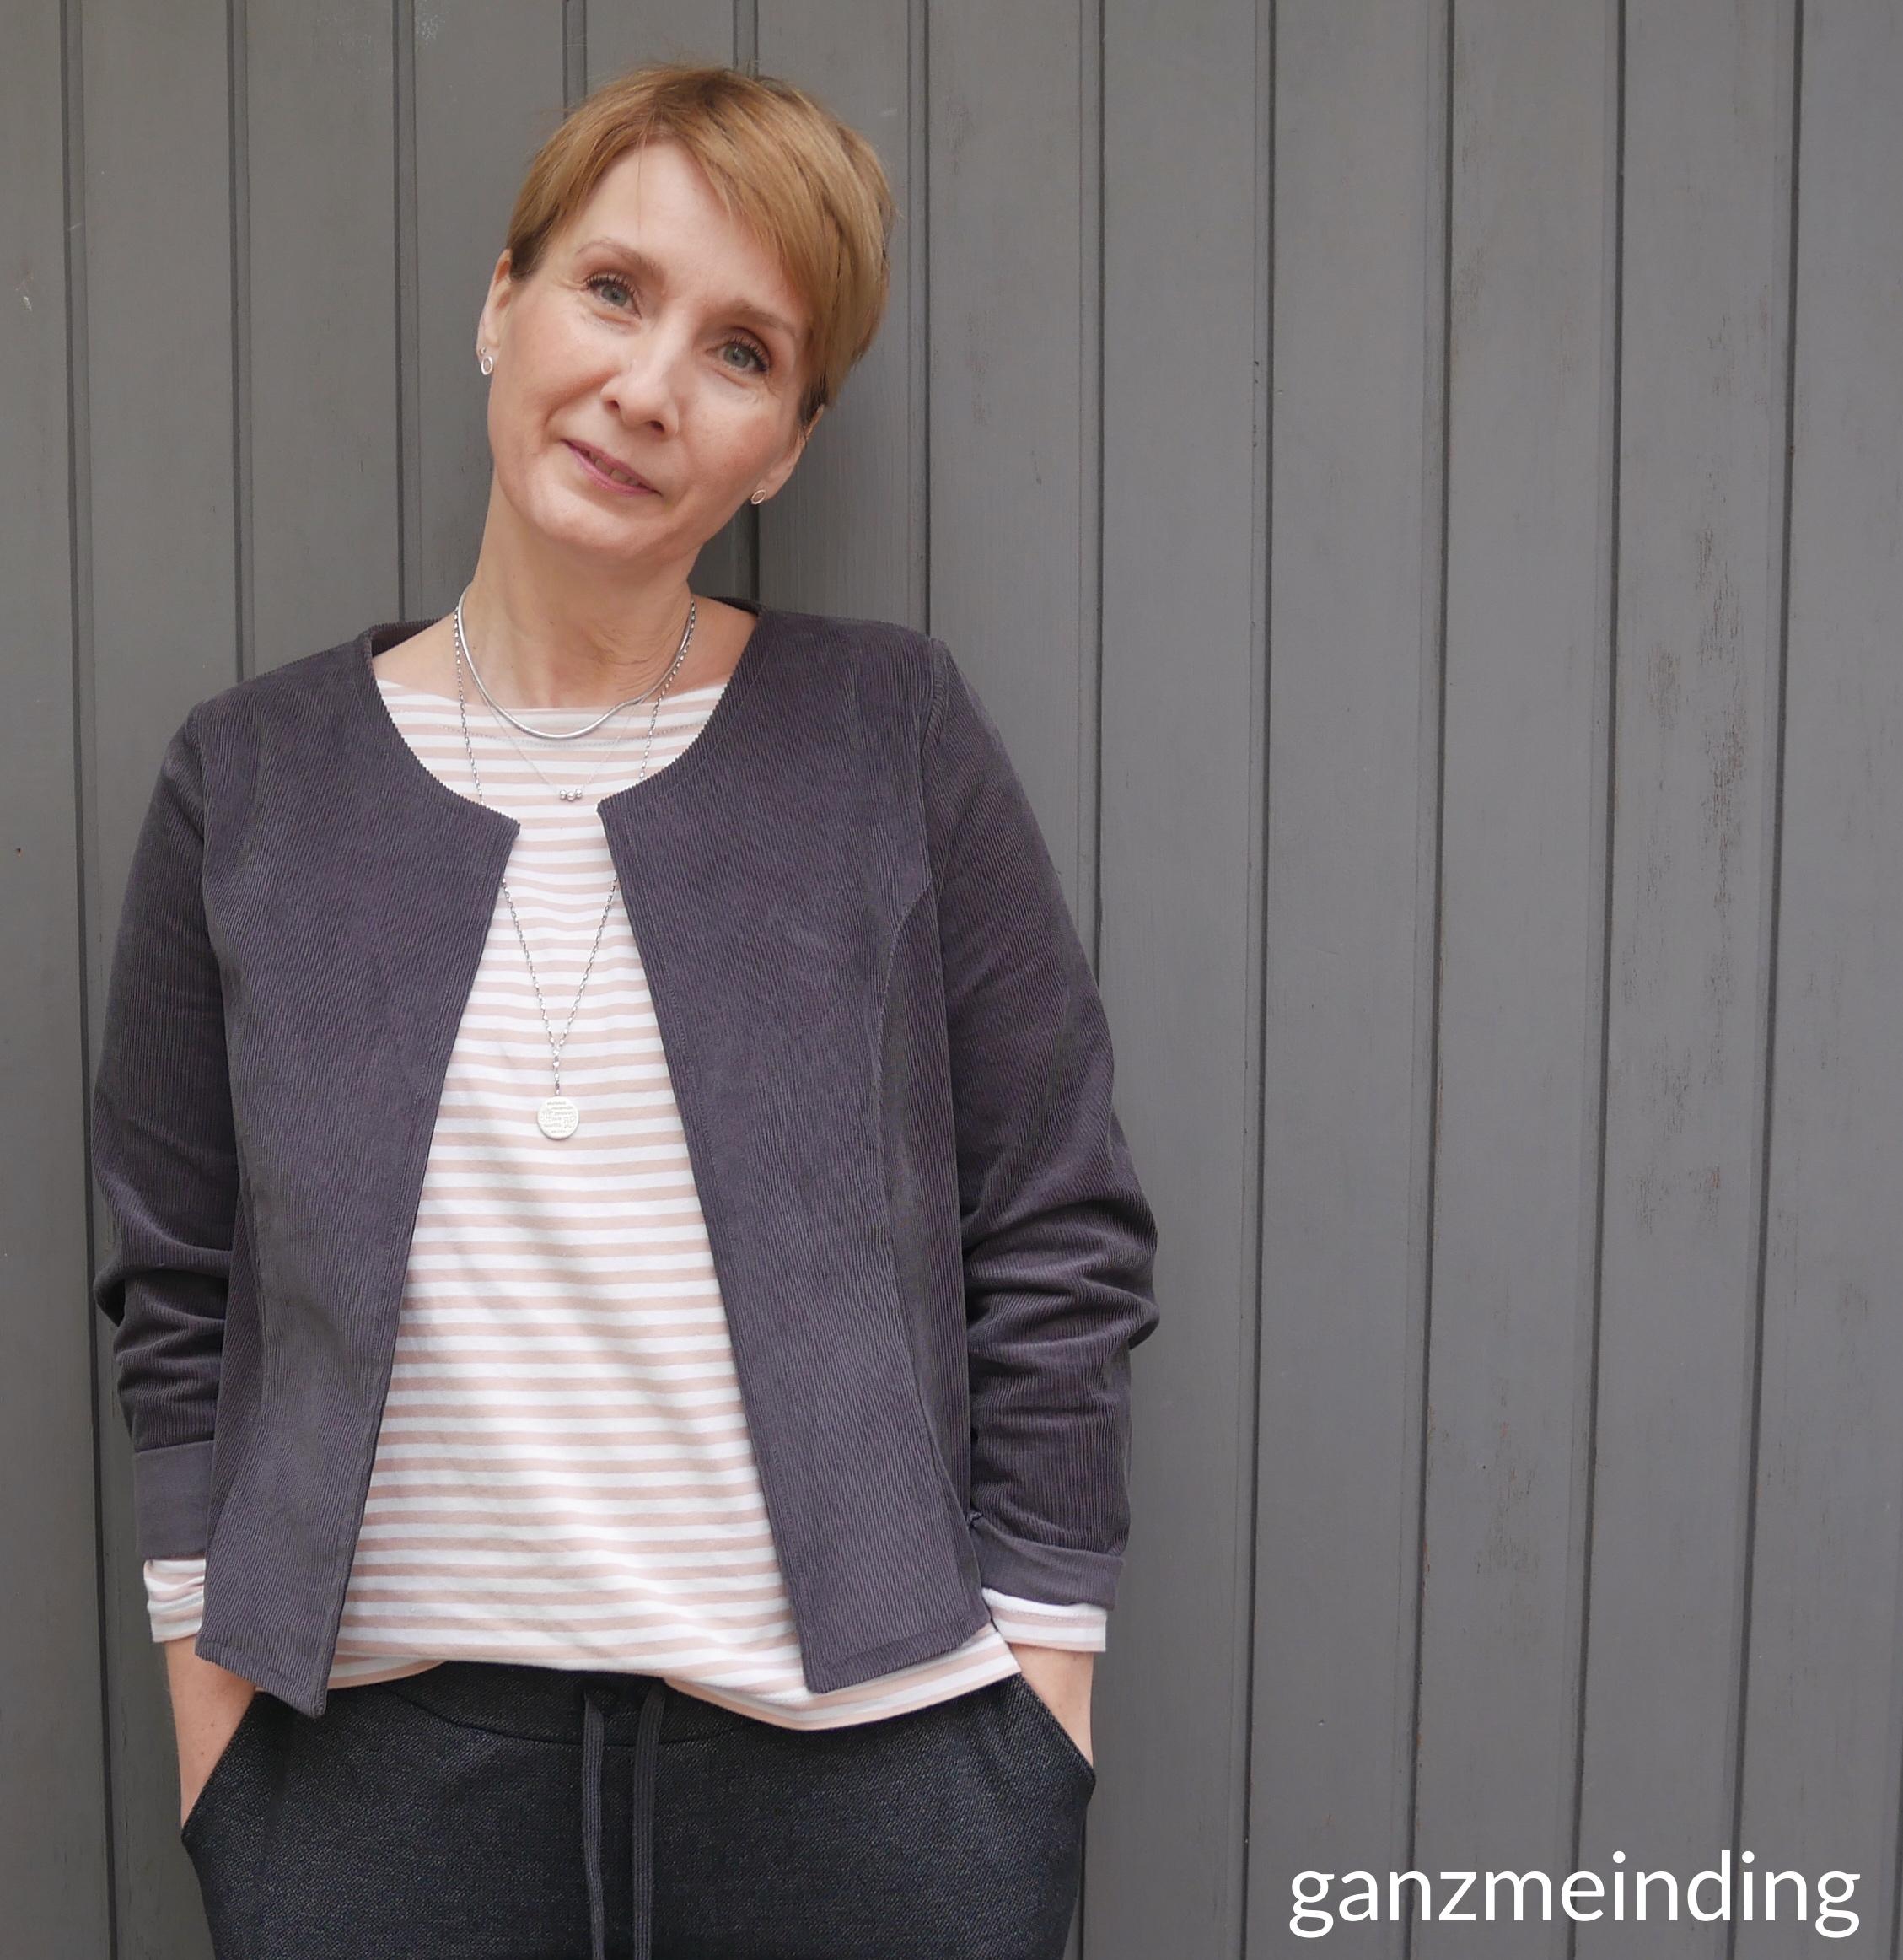 ganzmeinding: Mona LMV, Cord Robert Kaufmann, Timpe Tee, Frau Paula Hedi näht 02